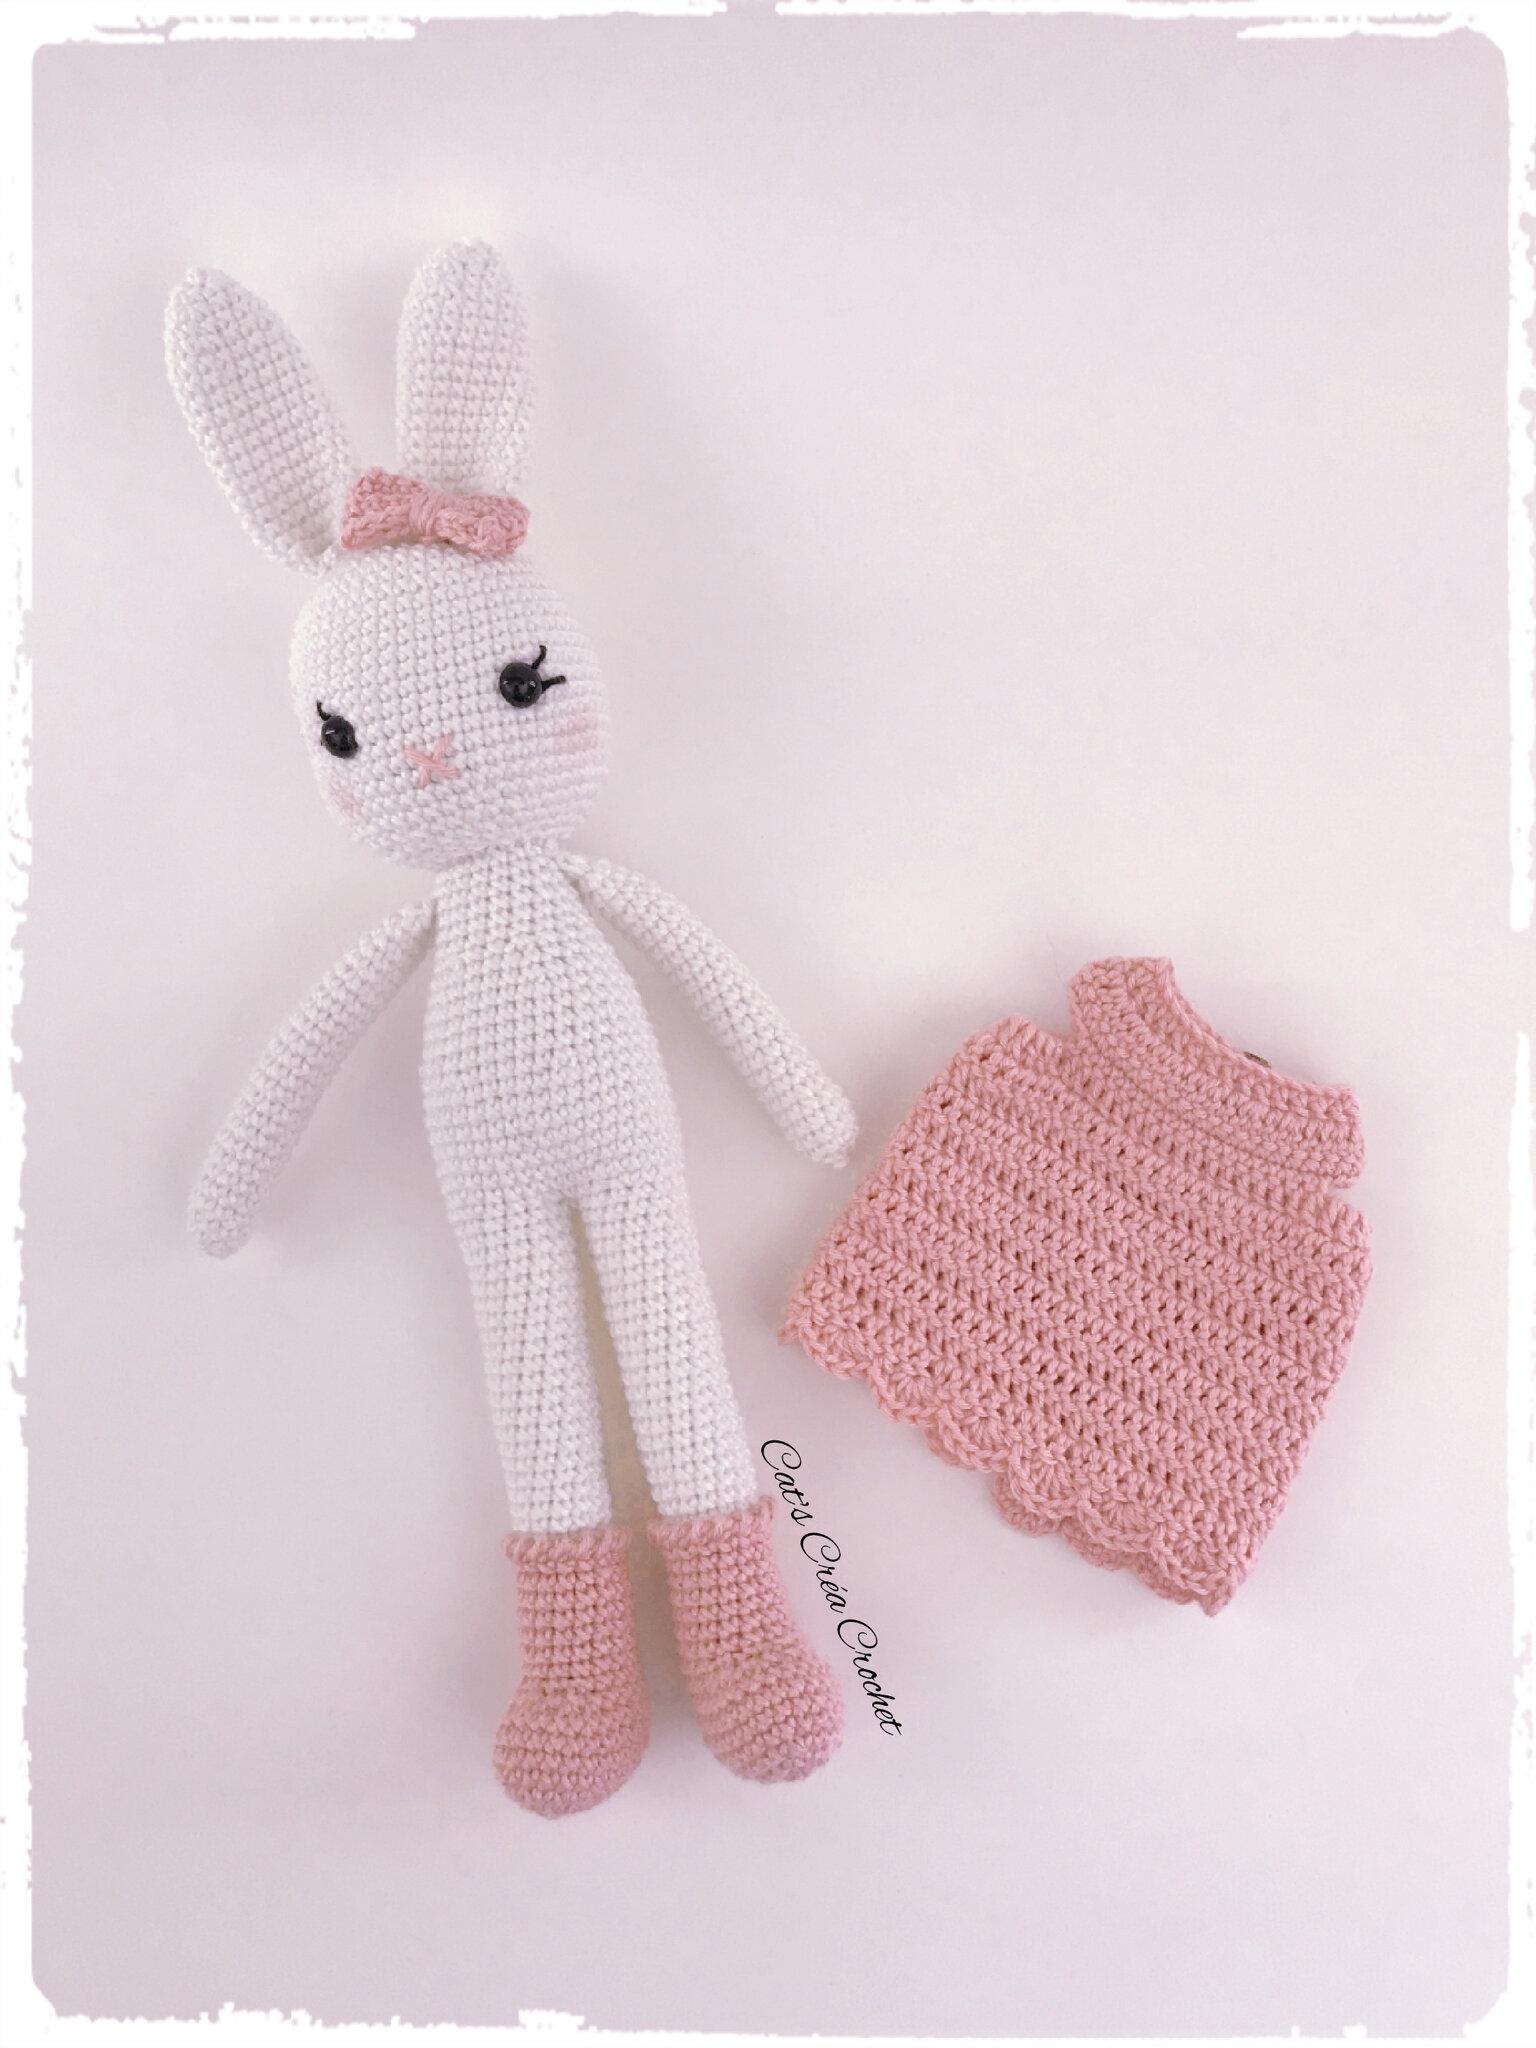 Doudou lapin patron au crochet - lespelotesandco.over-blog.com | 2048x1536